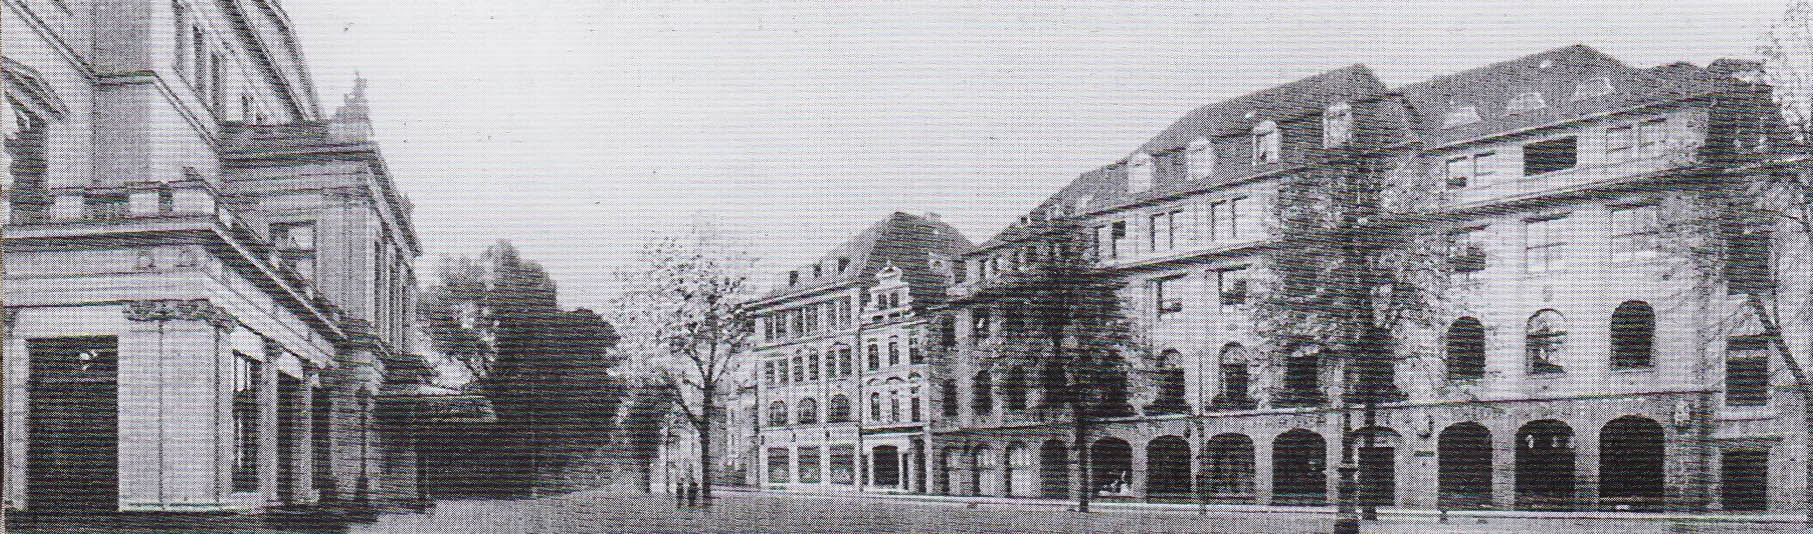 Bremen am Wall 175-177, links das alte Bremer Theater